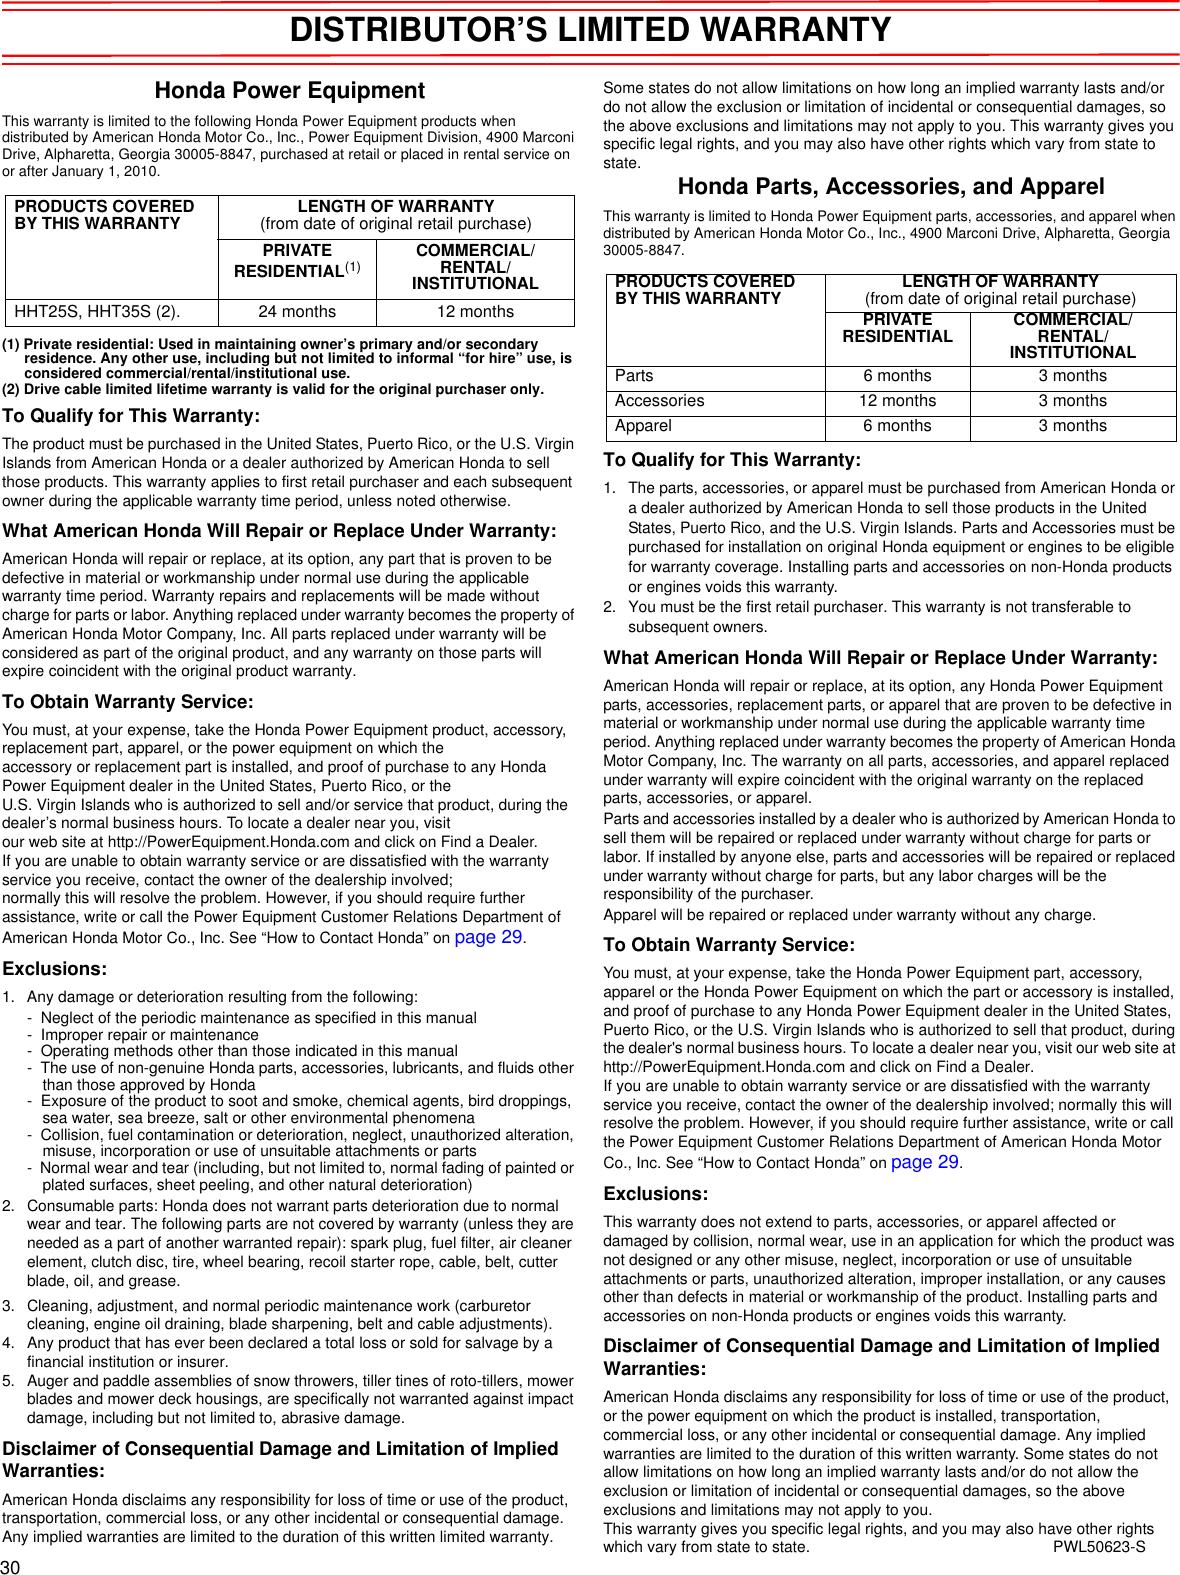 Honda Hht25S Hafa 1000001 Through 9999999 Owners Manual